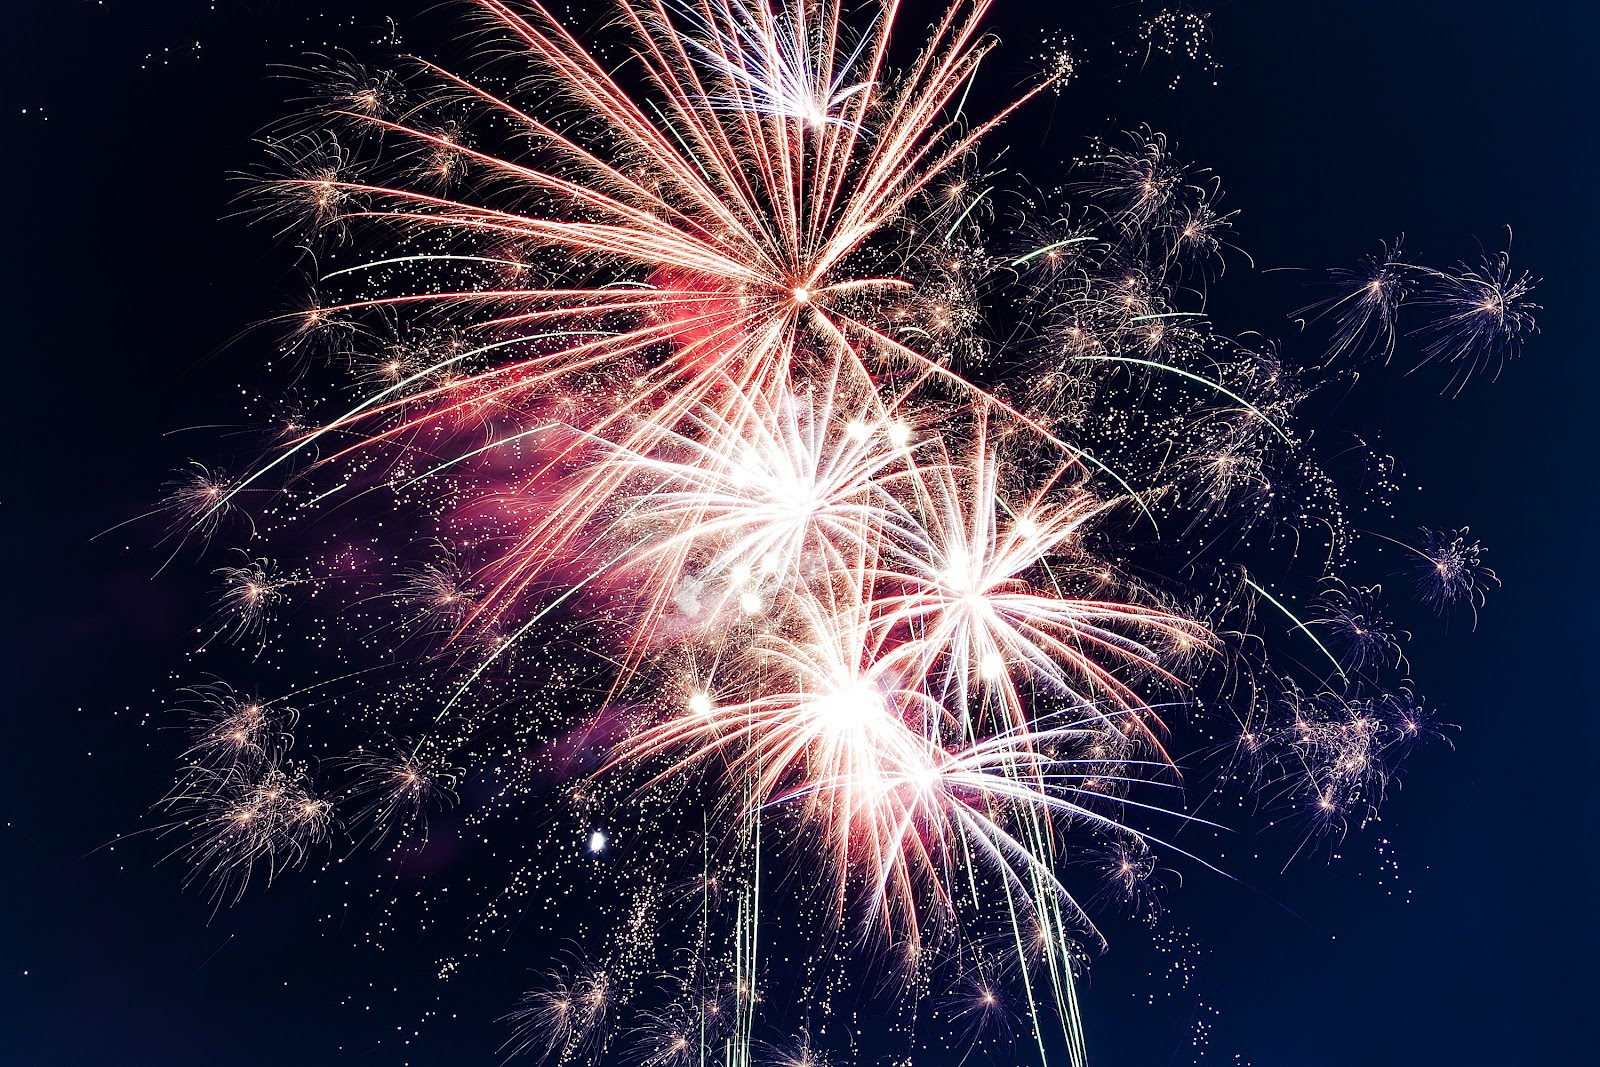 Fireworks Pexels